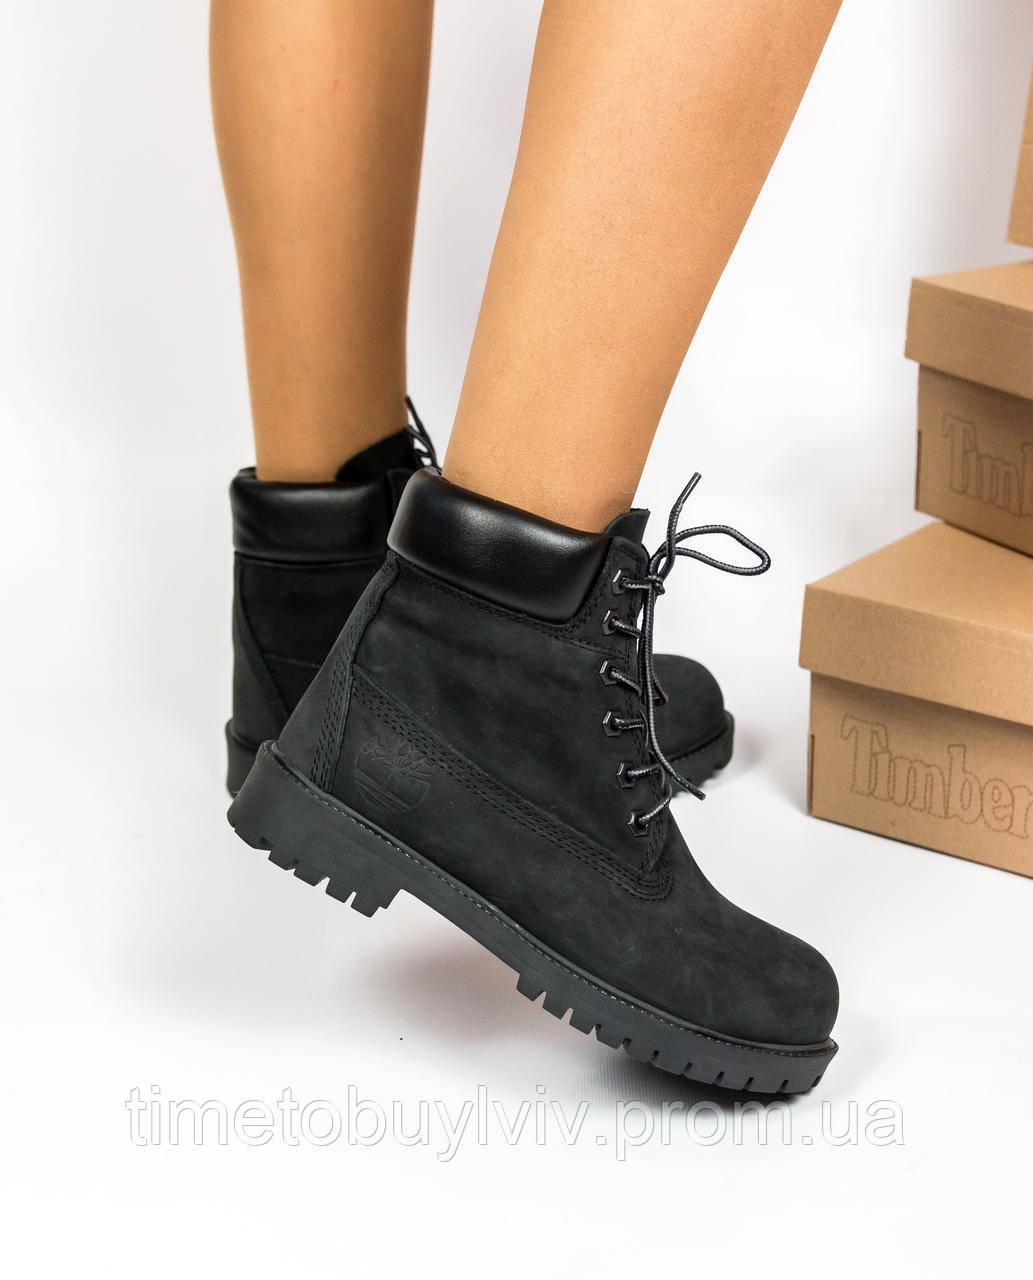 Зимние ботинки 35-46 размер, 3 Цвета